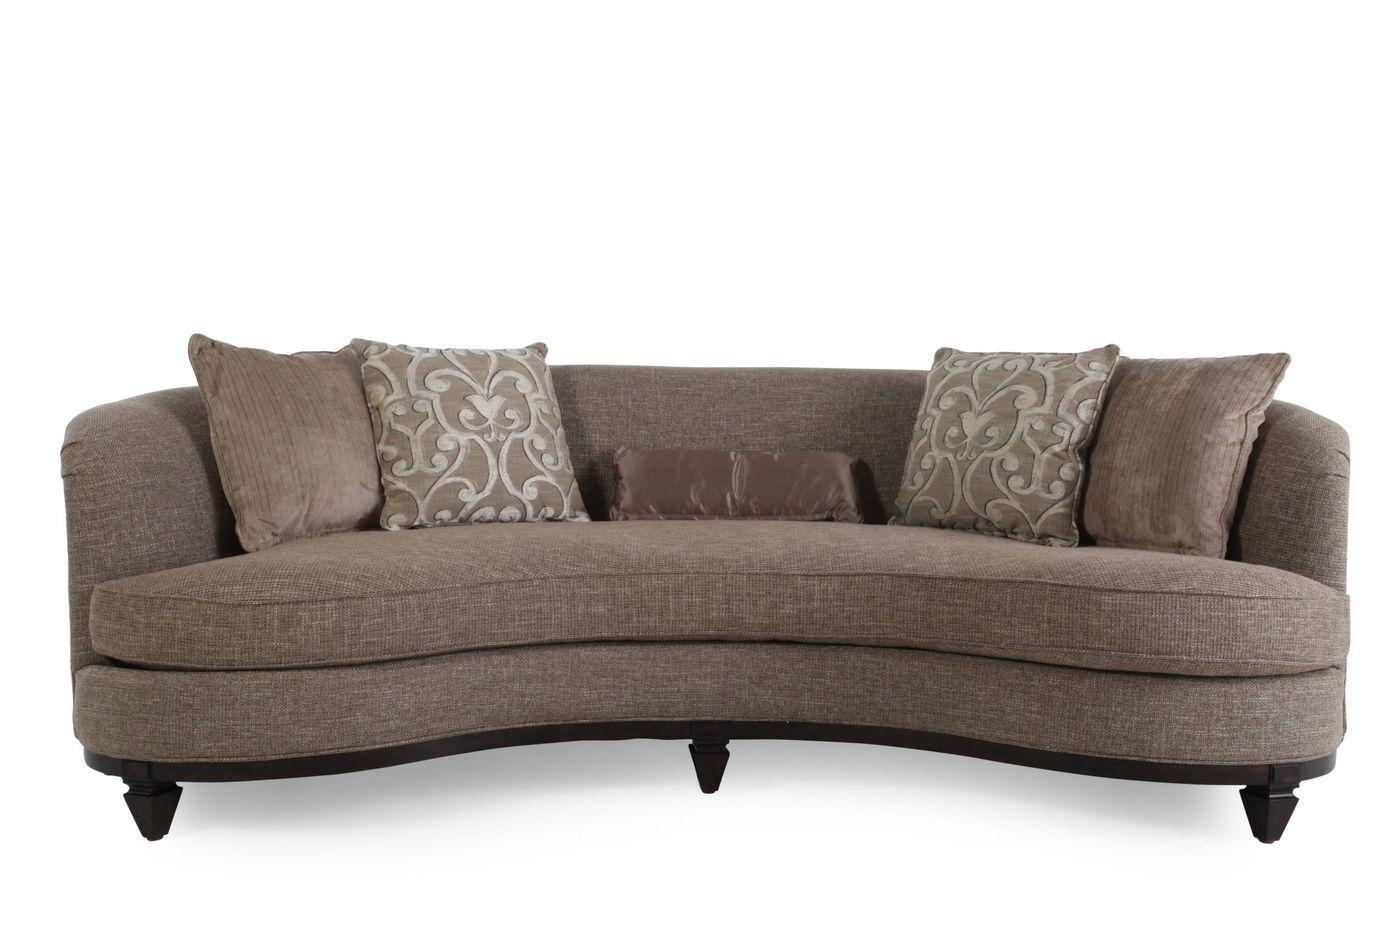 Rachlin Classics Grace Sofa | Mathis Brothers Furniture | Classical Sofa |  Pinterest | Brothers Furniture, Living Room Furniture And Living Rooms